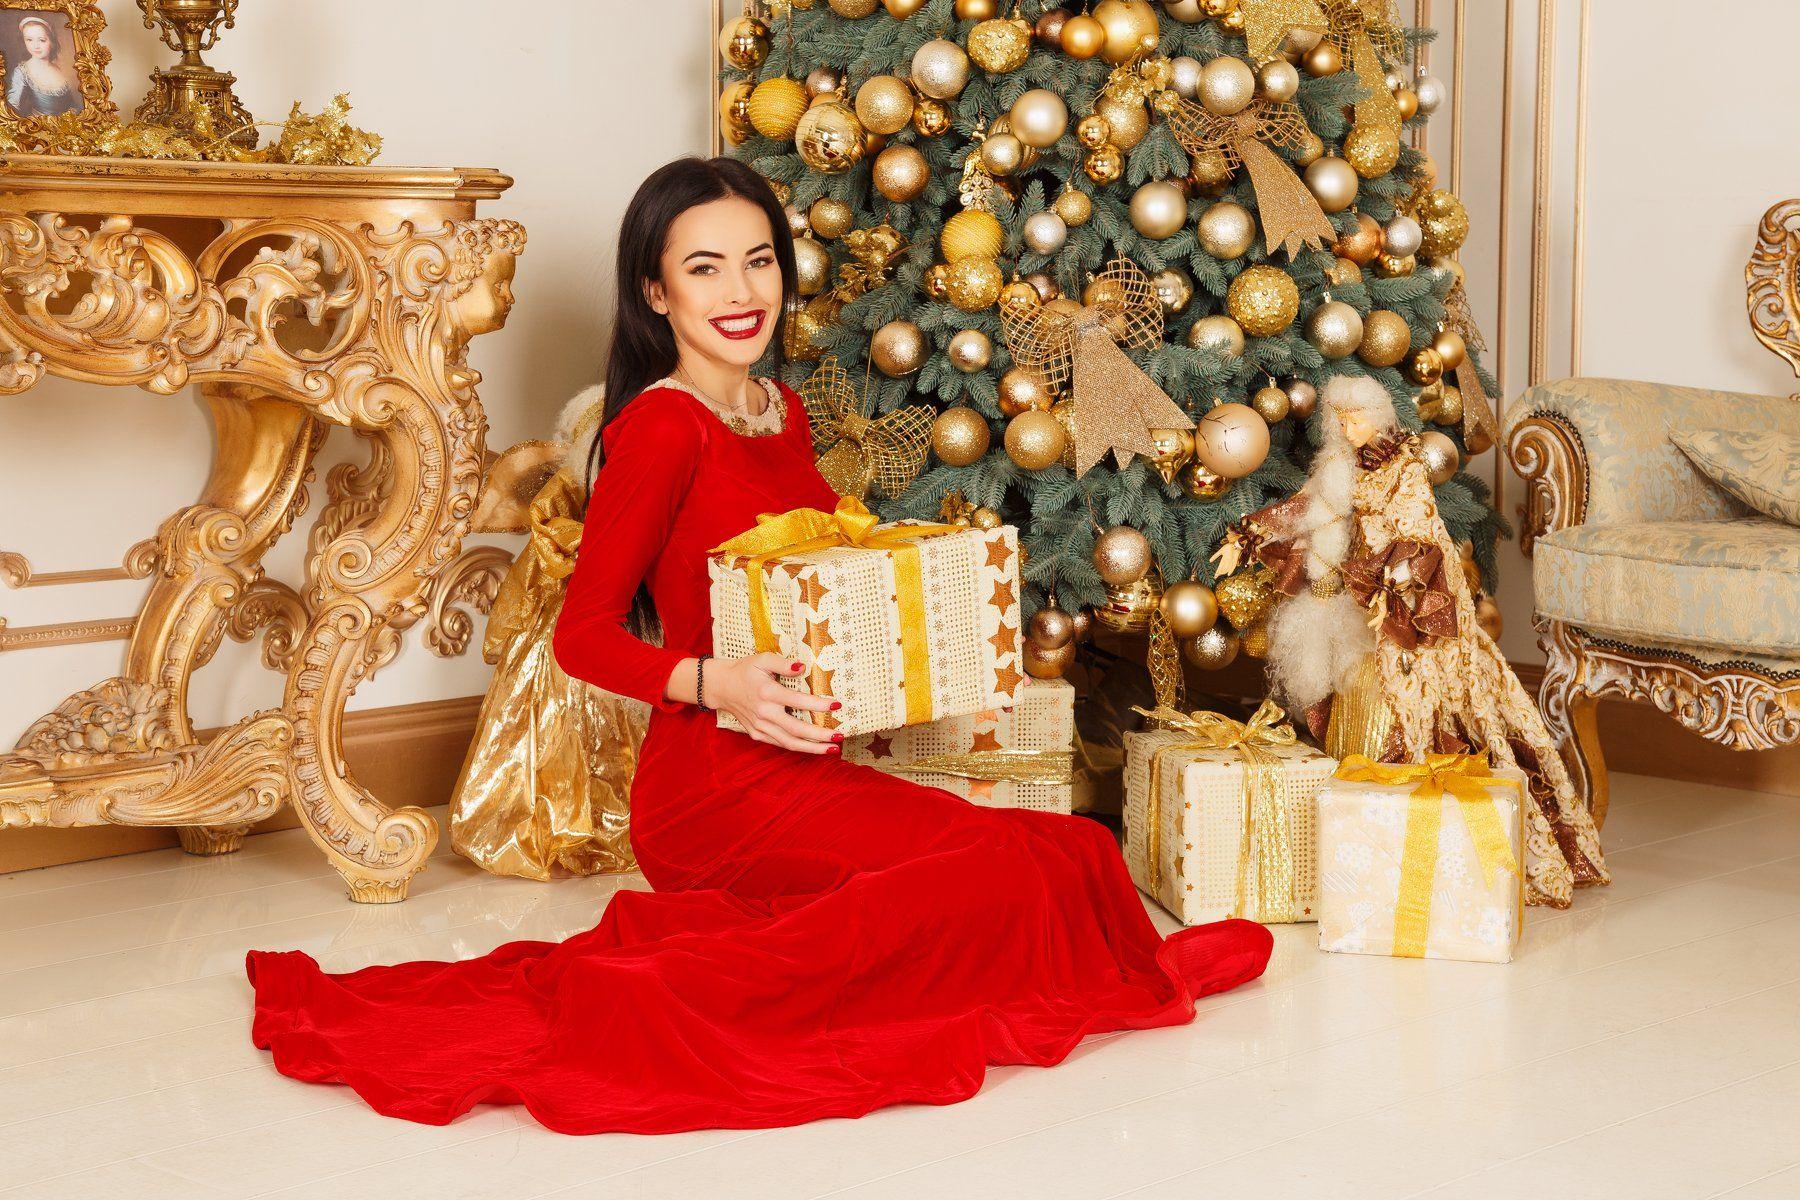 елка, портрет, девушка, подарки, платье, Кривонос Вячеслав